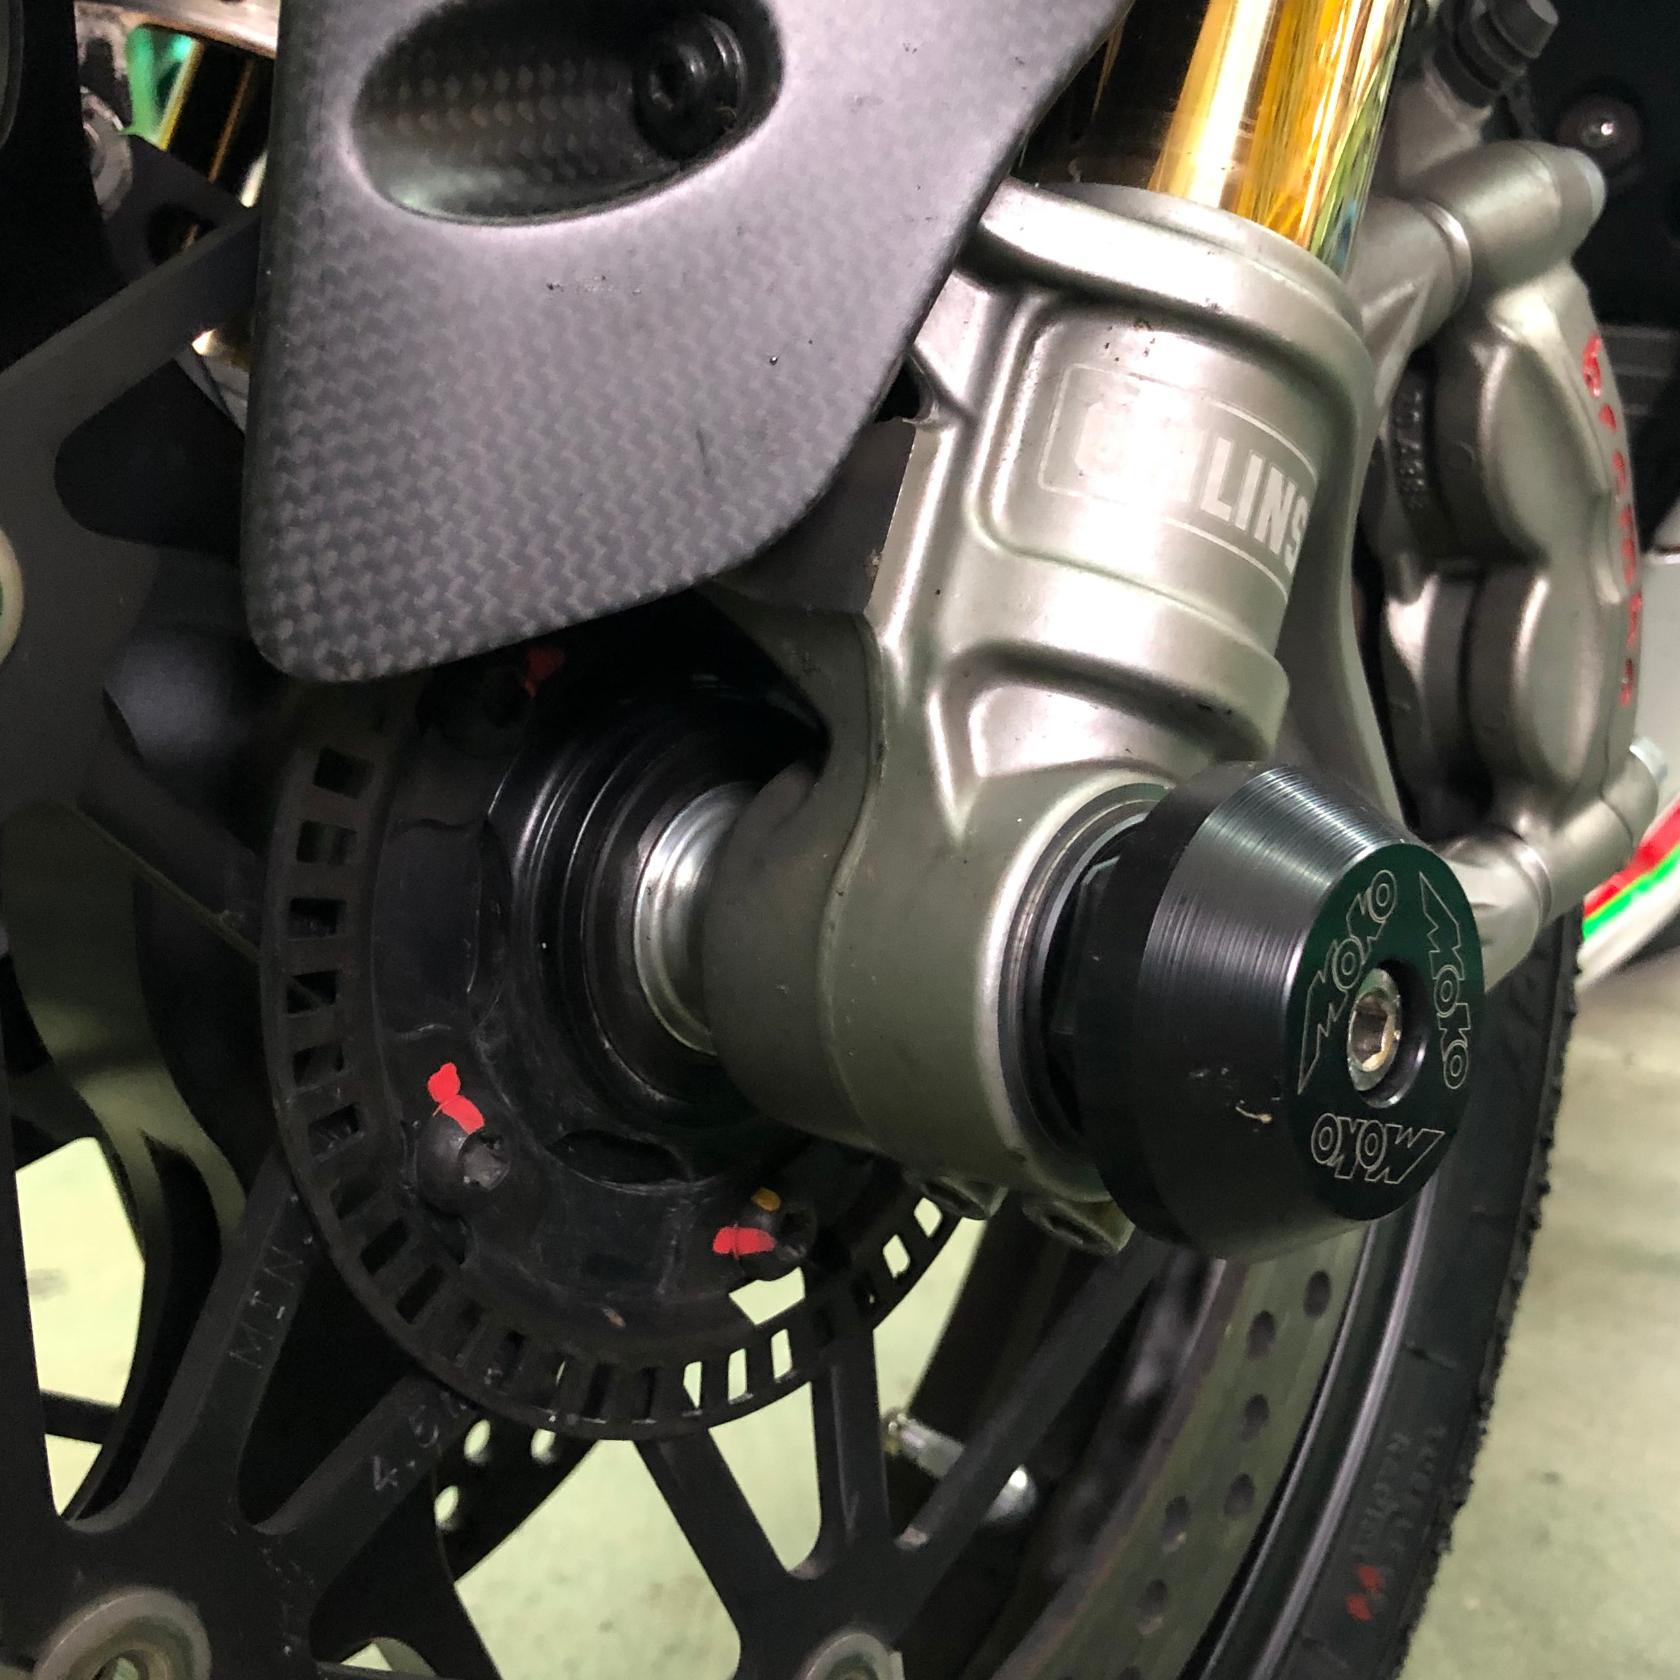 Ducati-Panigale-V2-V4-Gabel-Sturzpads-Moko_1680x1680